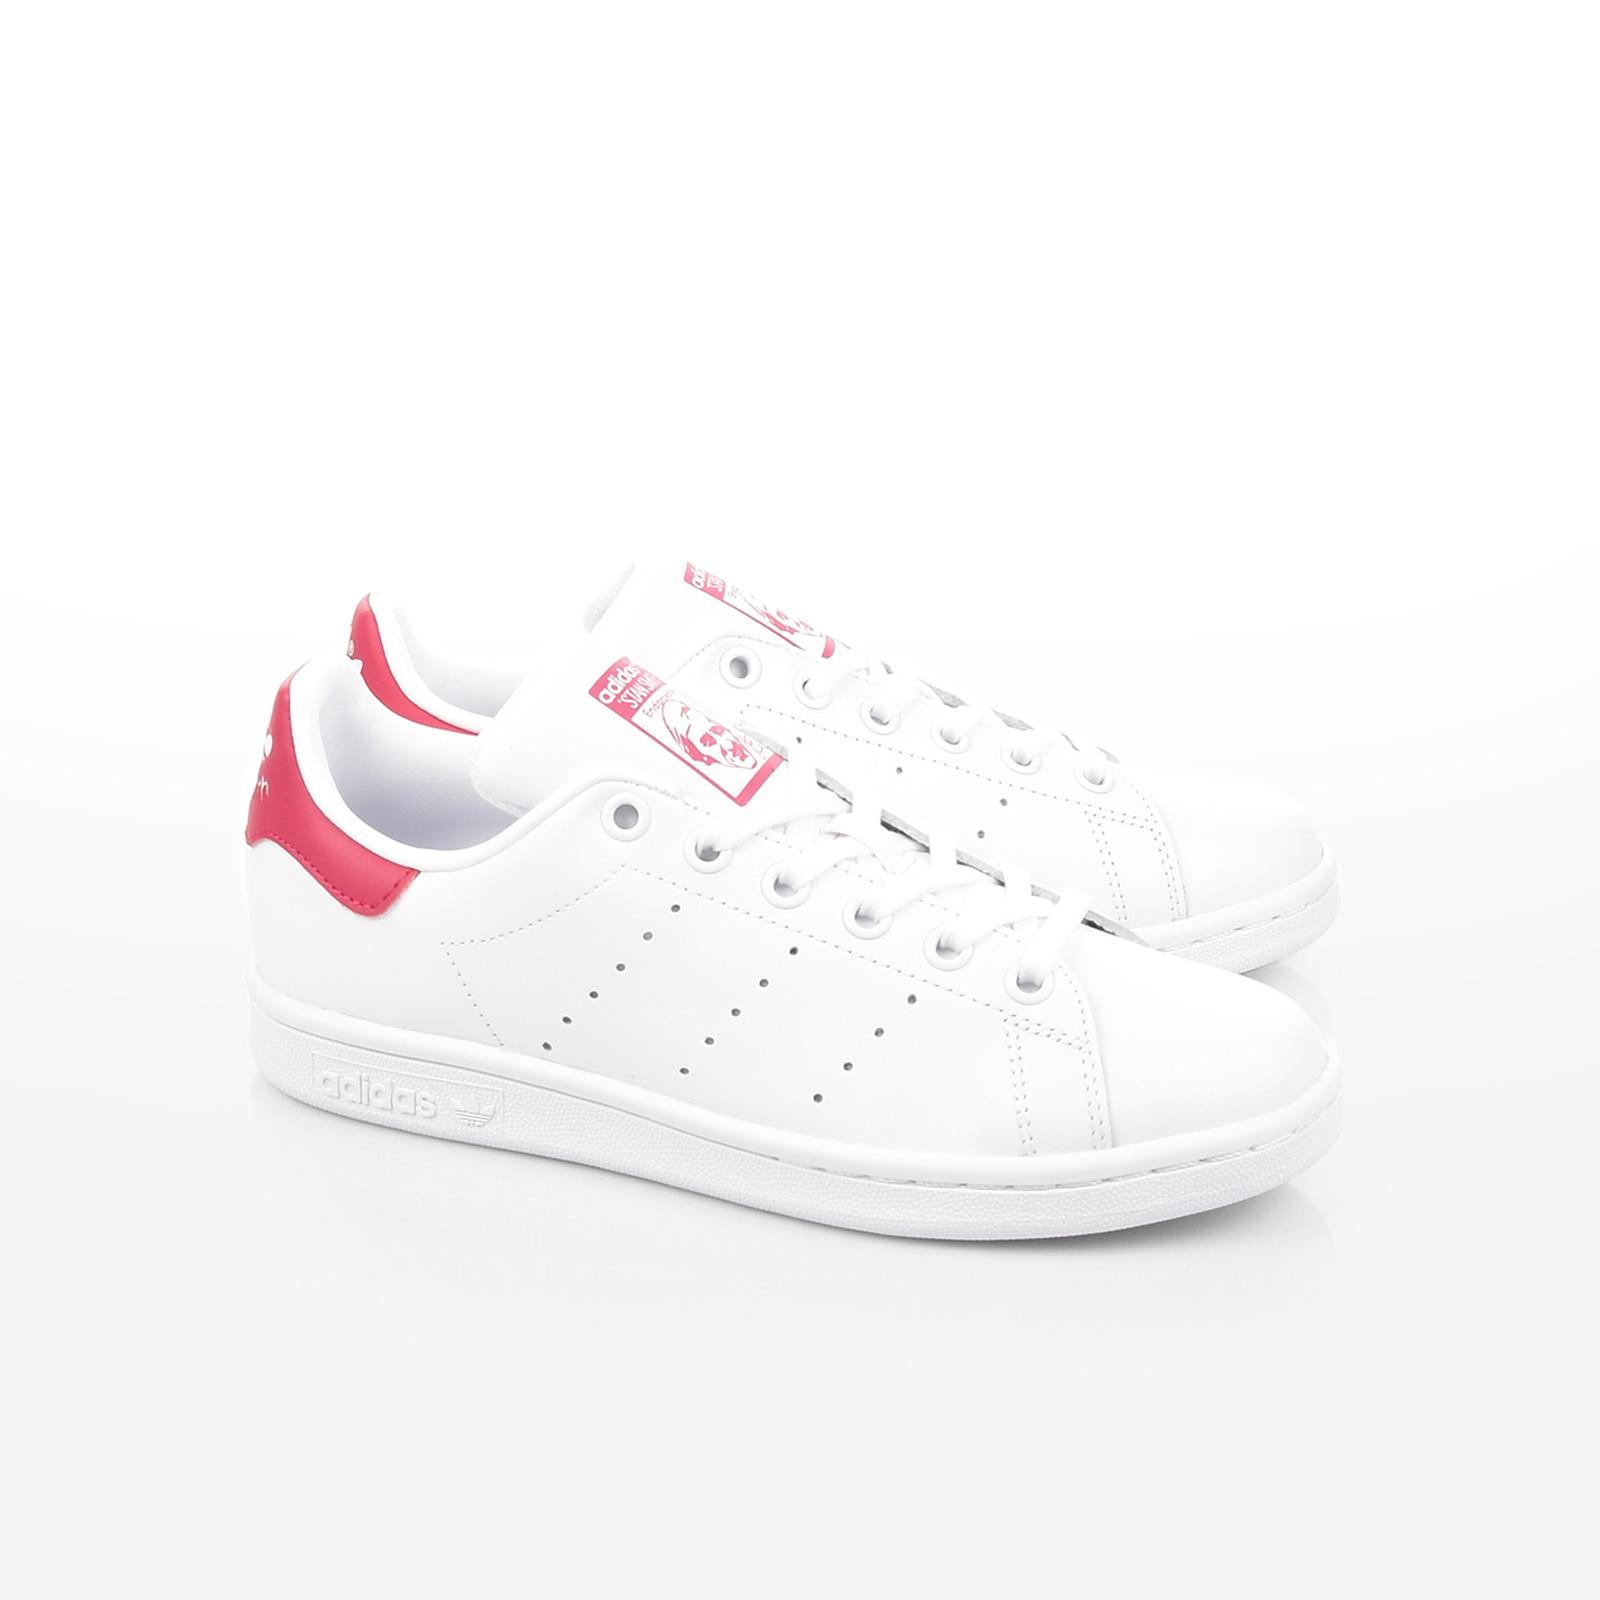 new design 50% price buy good Παιδικά Παπούτσια adidas Originals - Oneiros Shoes